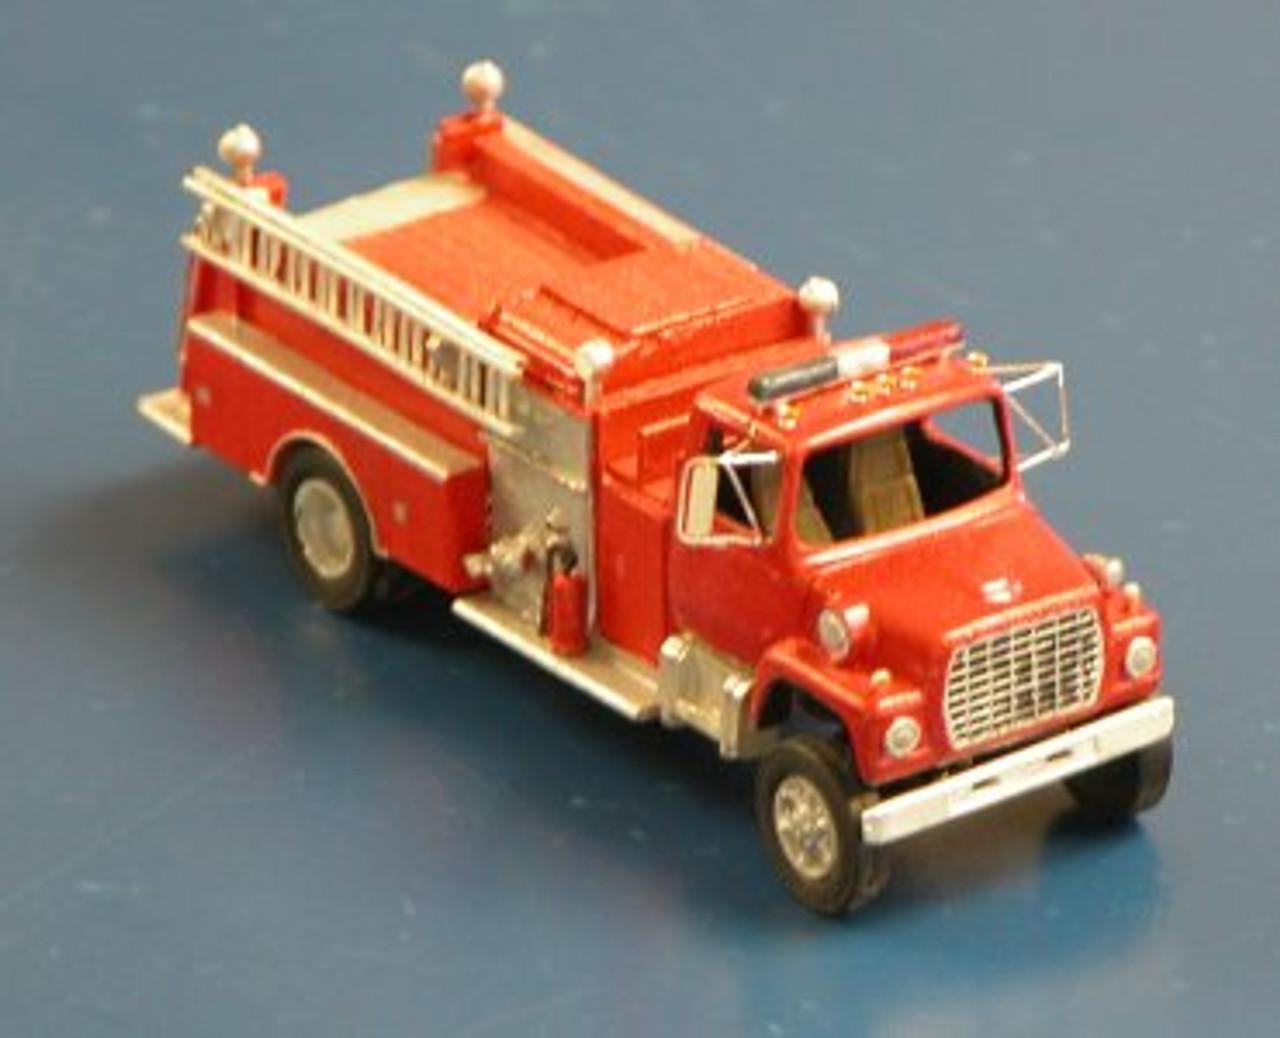 1969 Ford LN Fire Truck with Pierce Suburban Pumper Body Kit